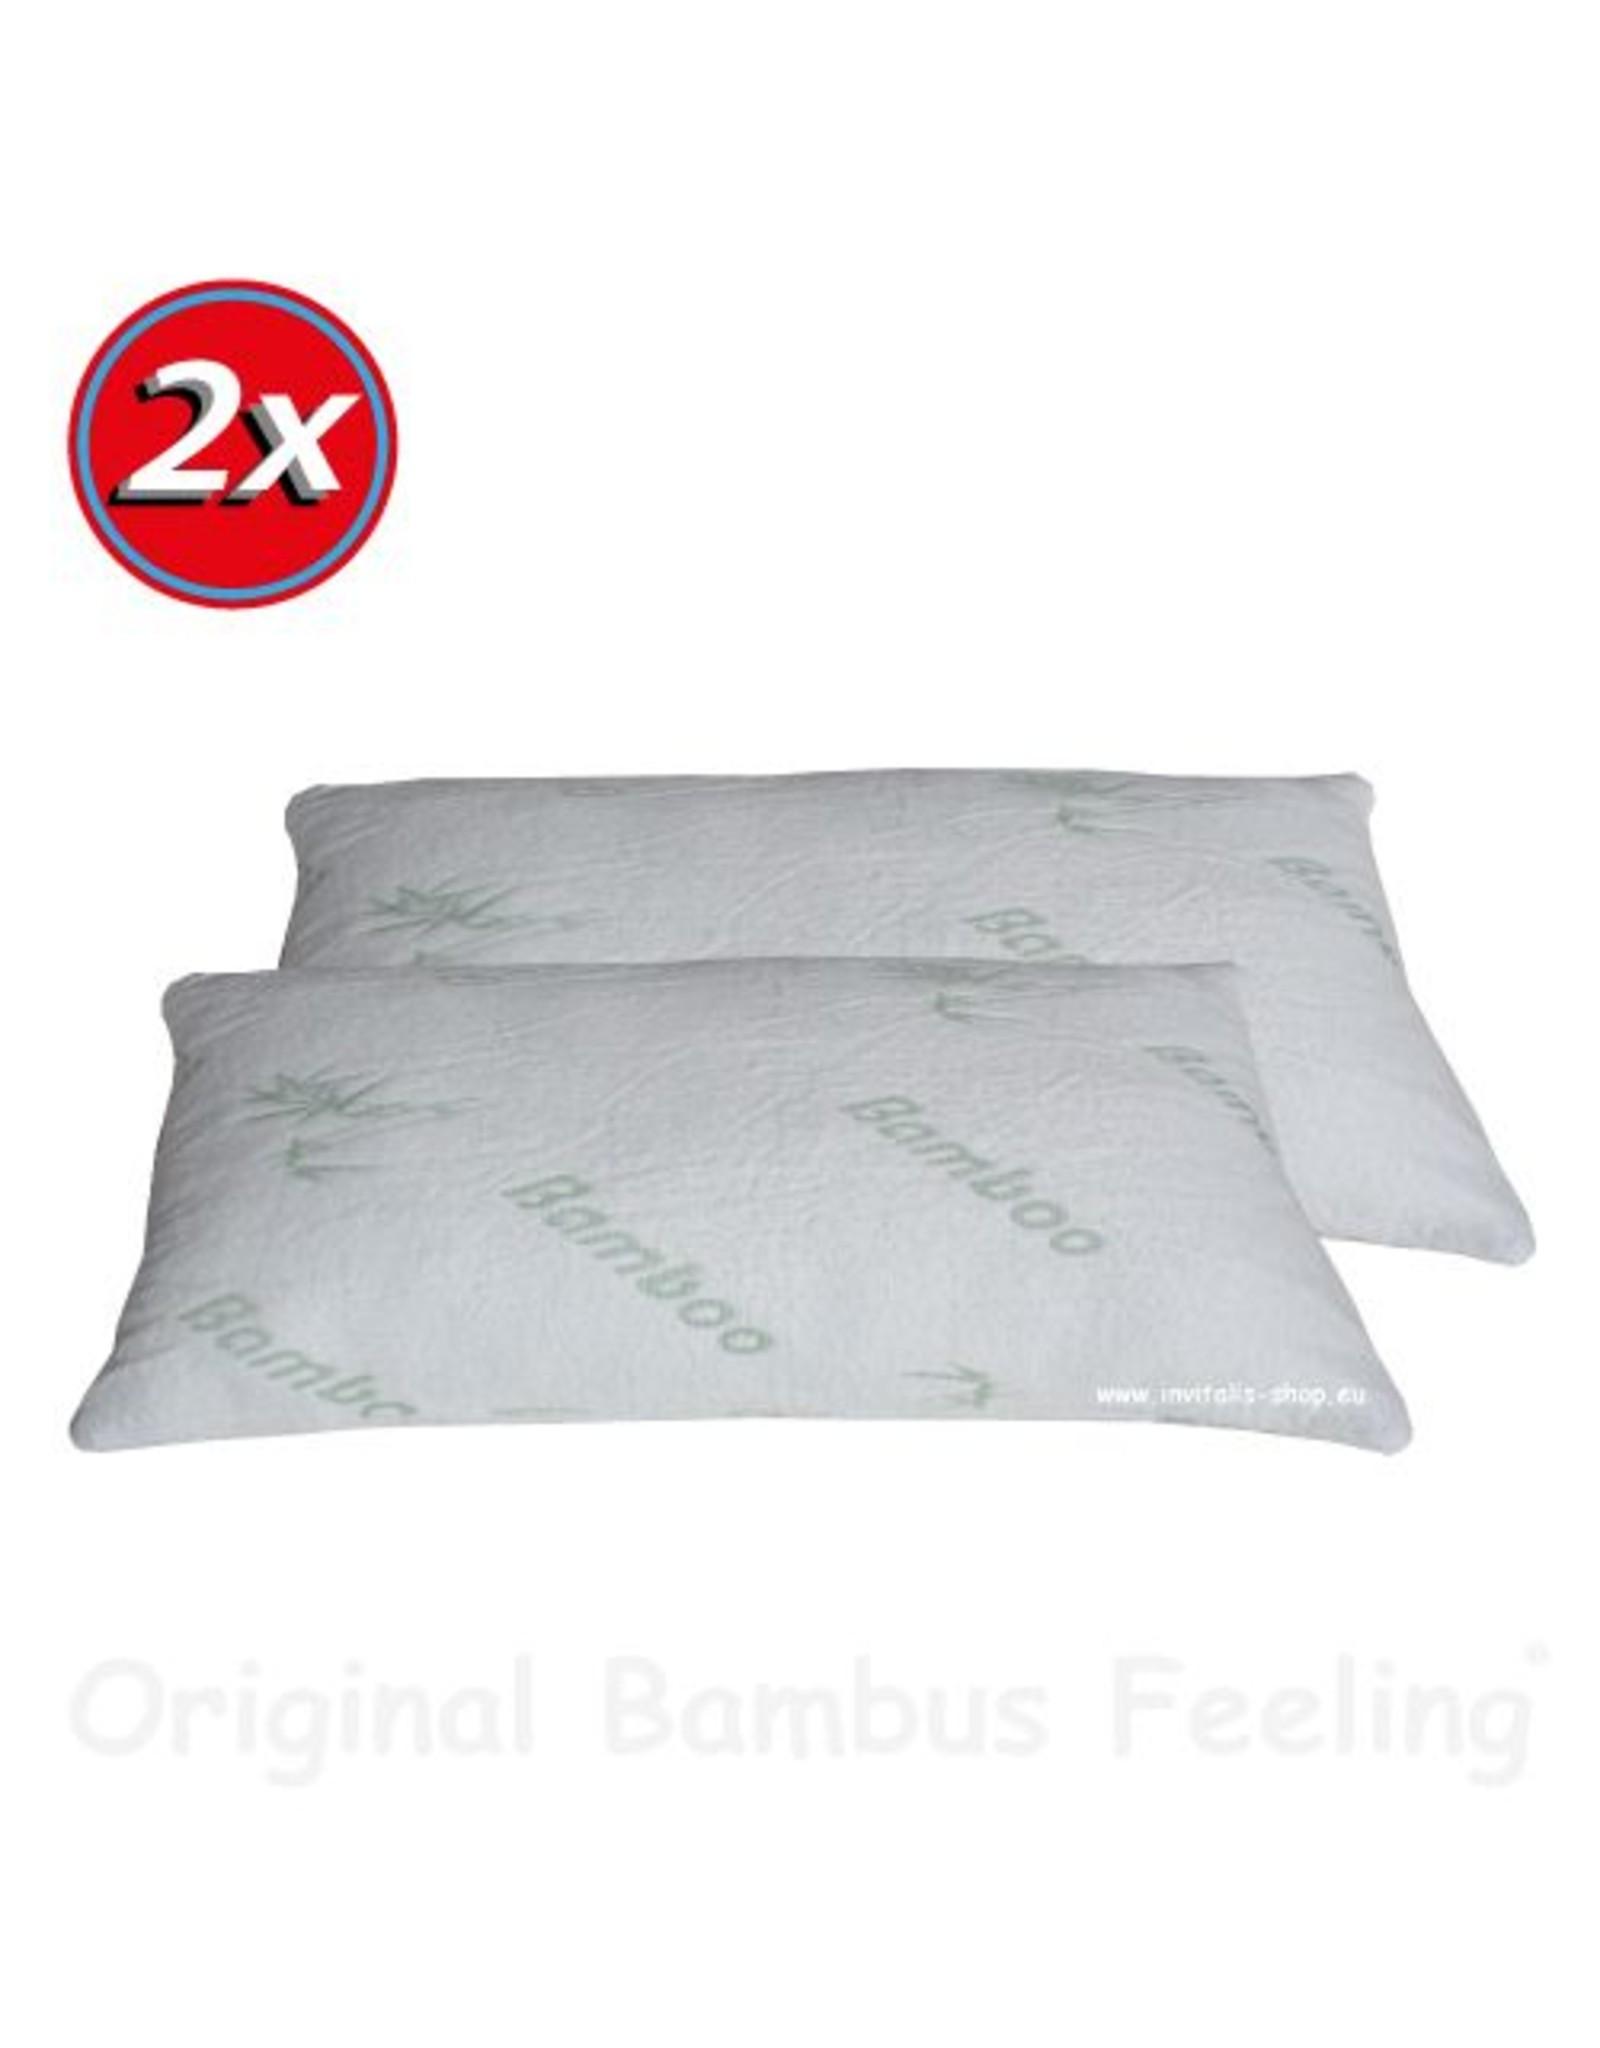 Bambus Kissen - 80x40cm 2er Sparset